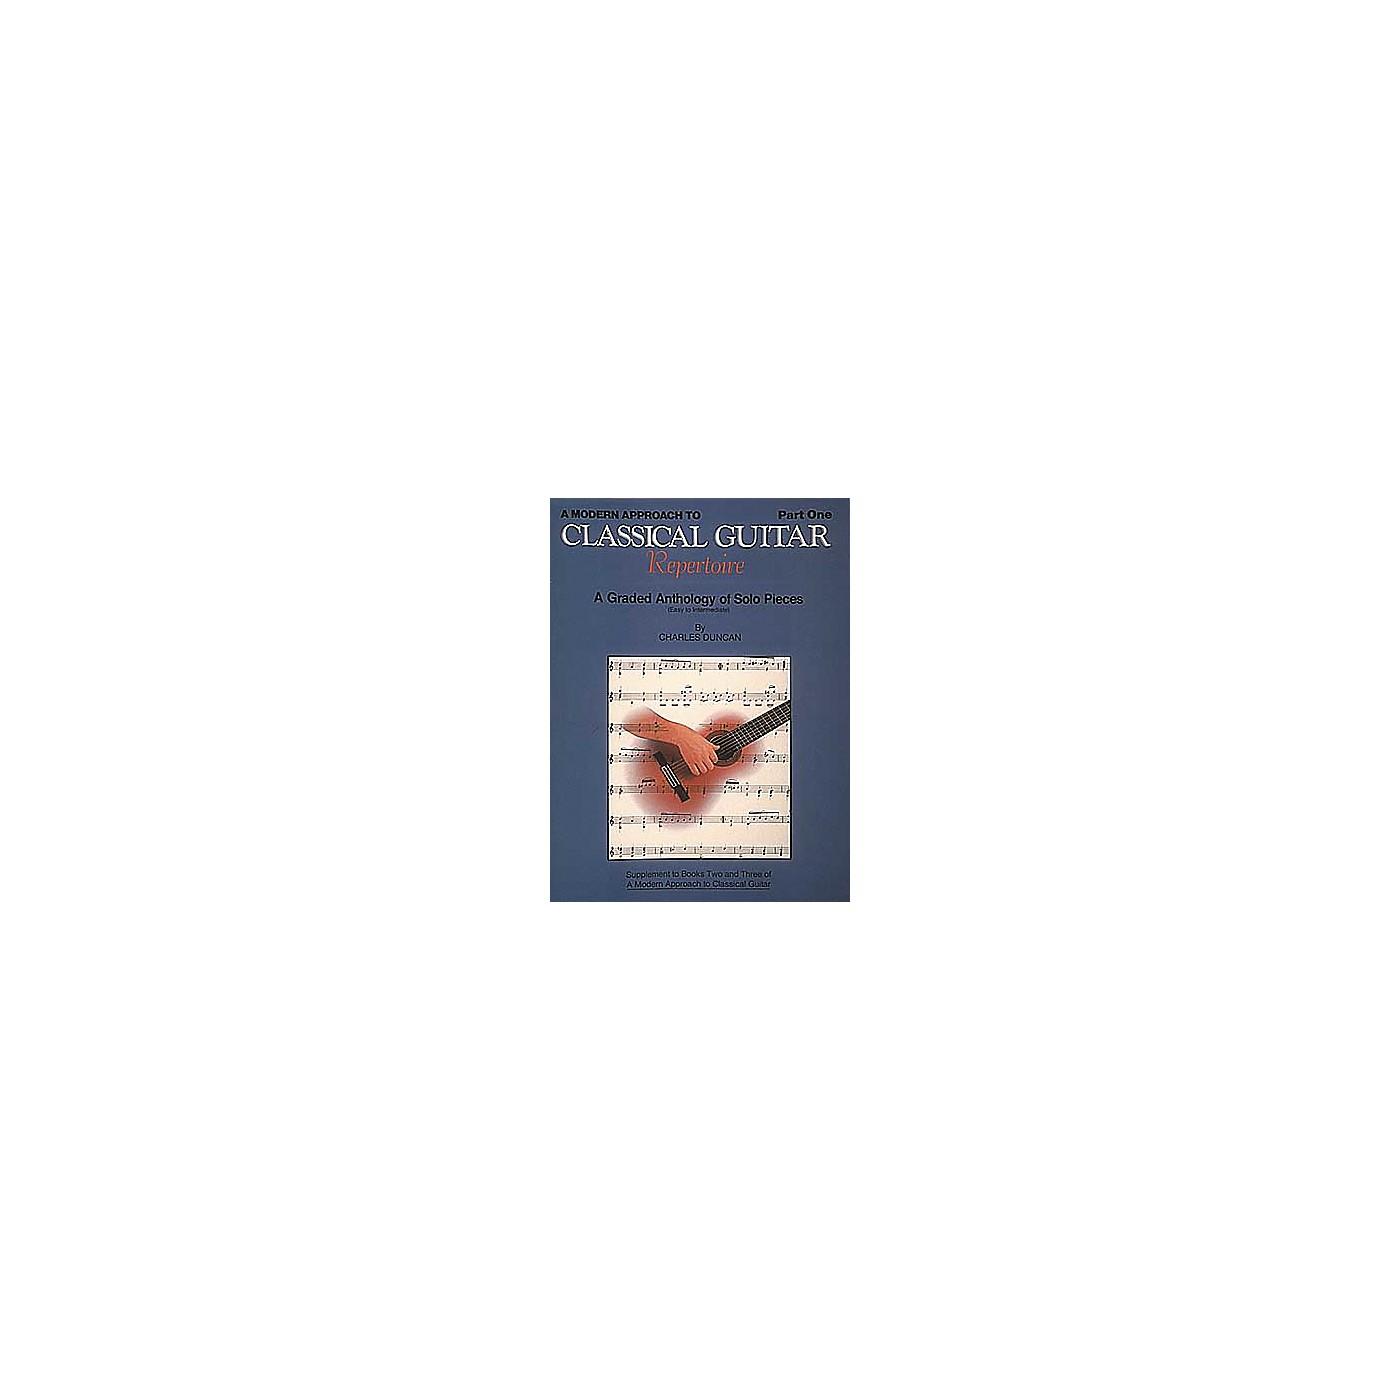 Hal Leonard A Modern Approach to Classical Repertoire - Part 1 Book thumbnail